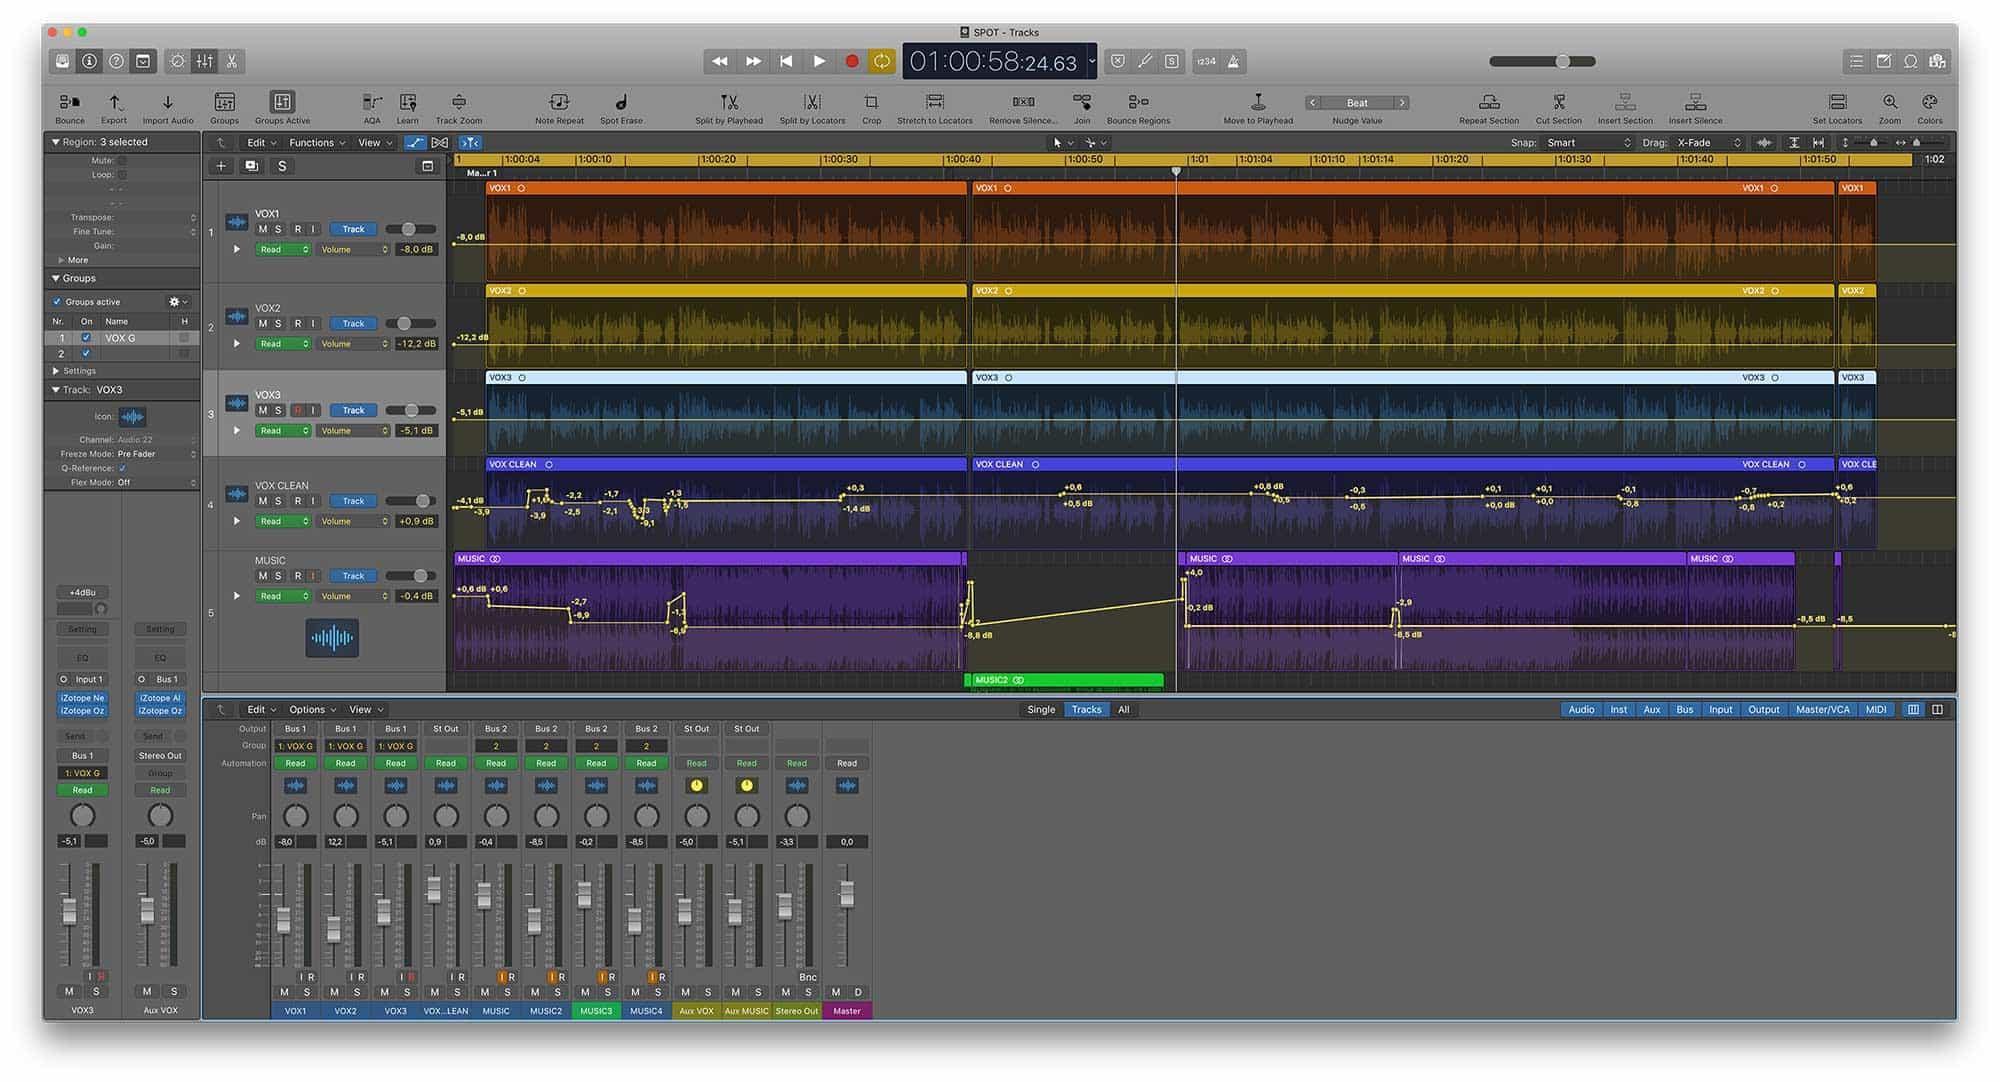 Logic_spot_audio_voce_1